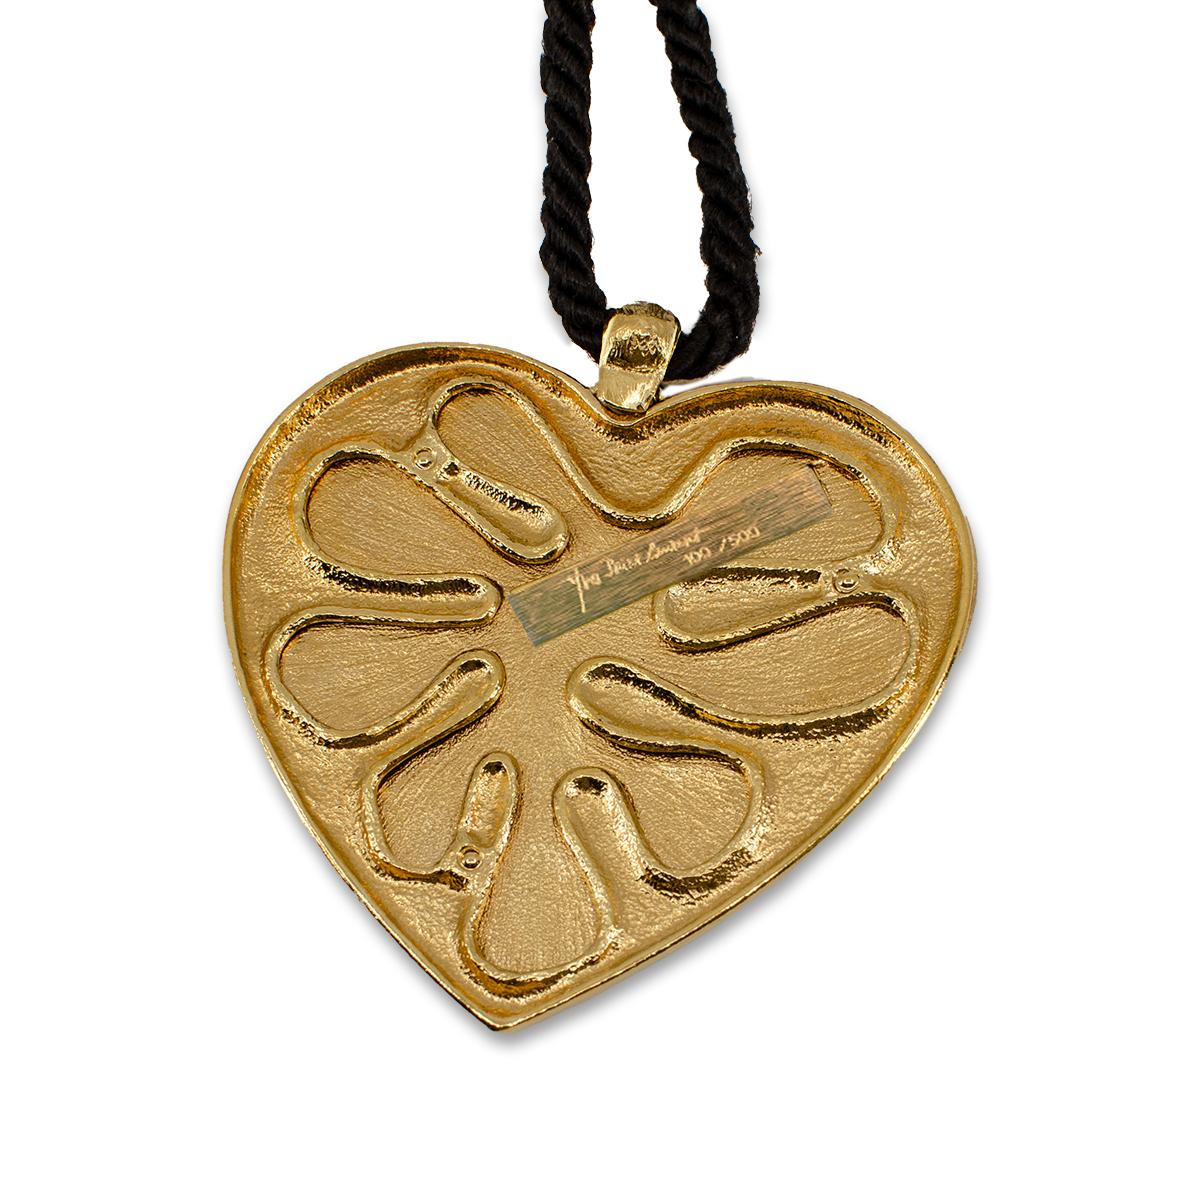 YSL jewelry mark